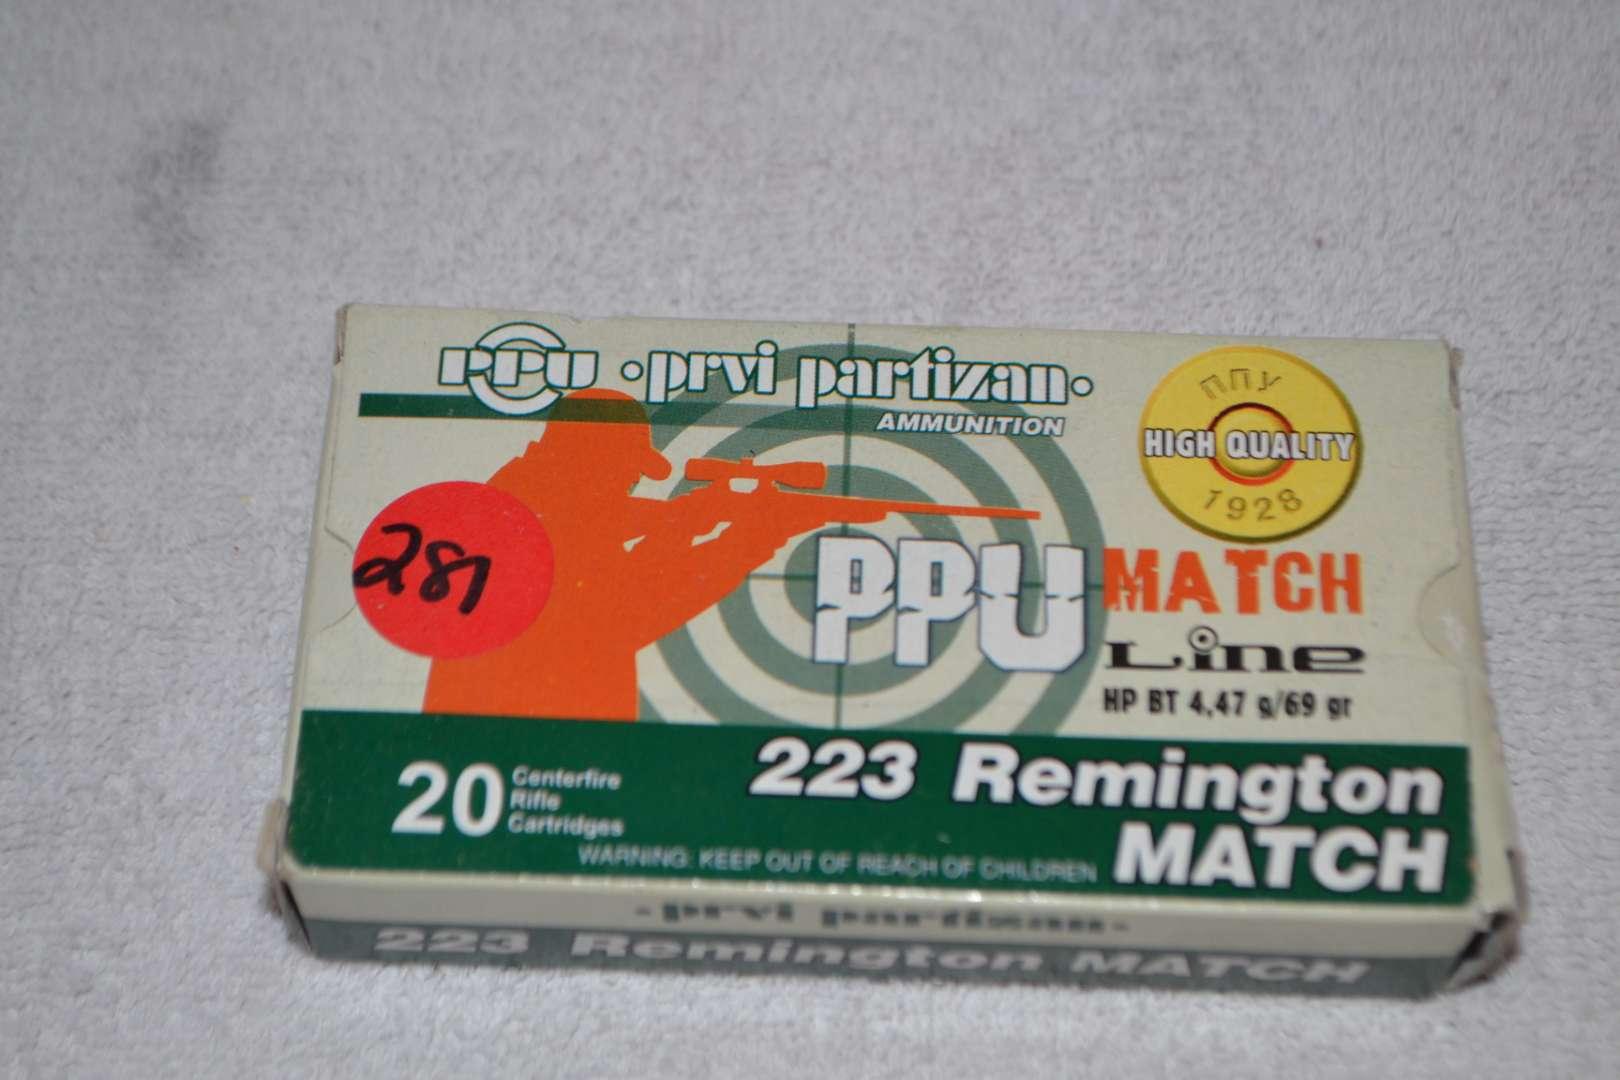 Lot # 281 223 REMINGTON MATCH 20 RIFLE CARTRIDGES